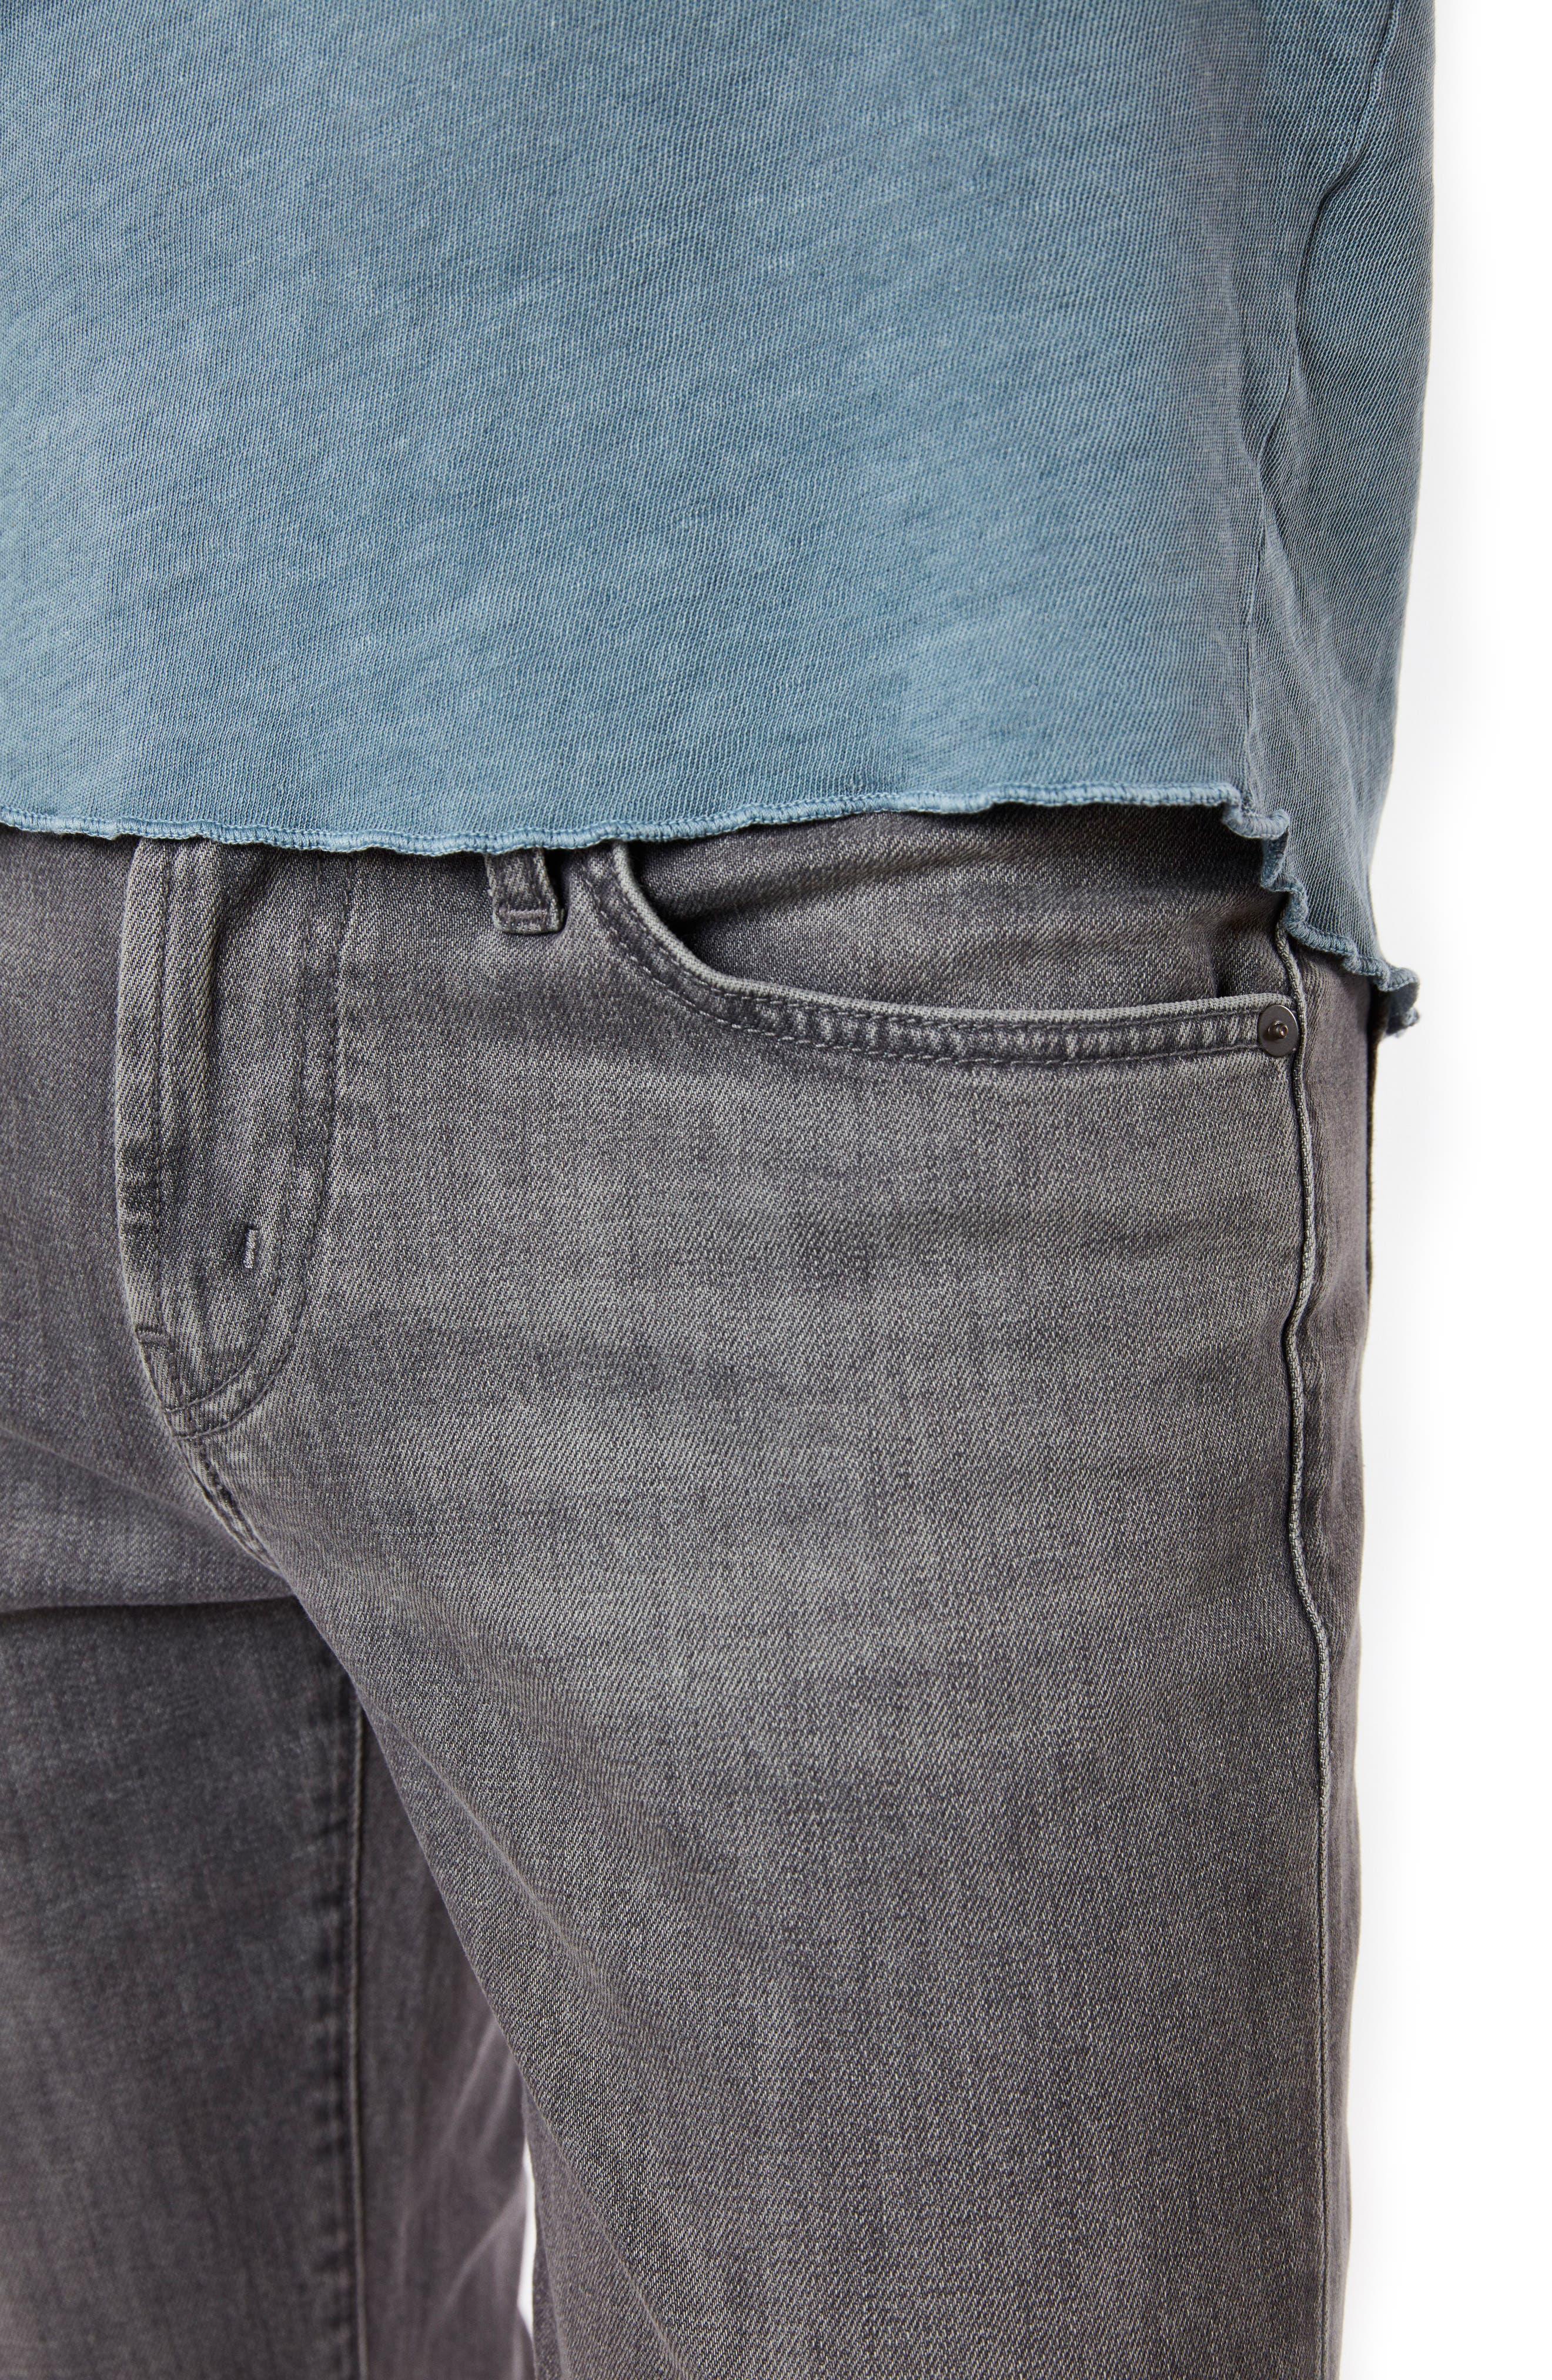 Tyler Slim Fit Jeans,                             Alternate thumbnail 4, color,                             Tributary